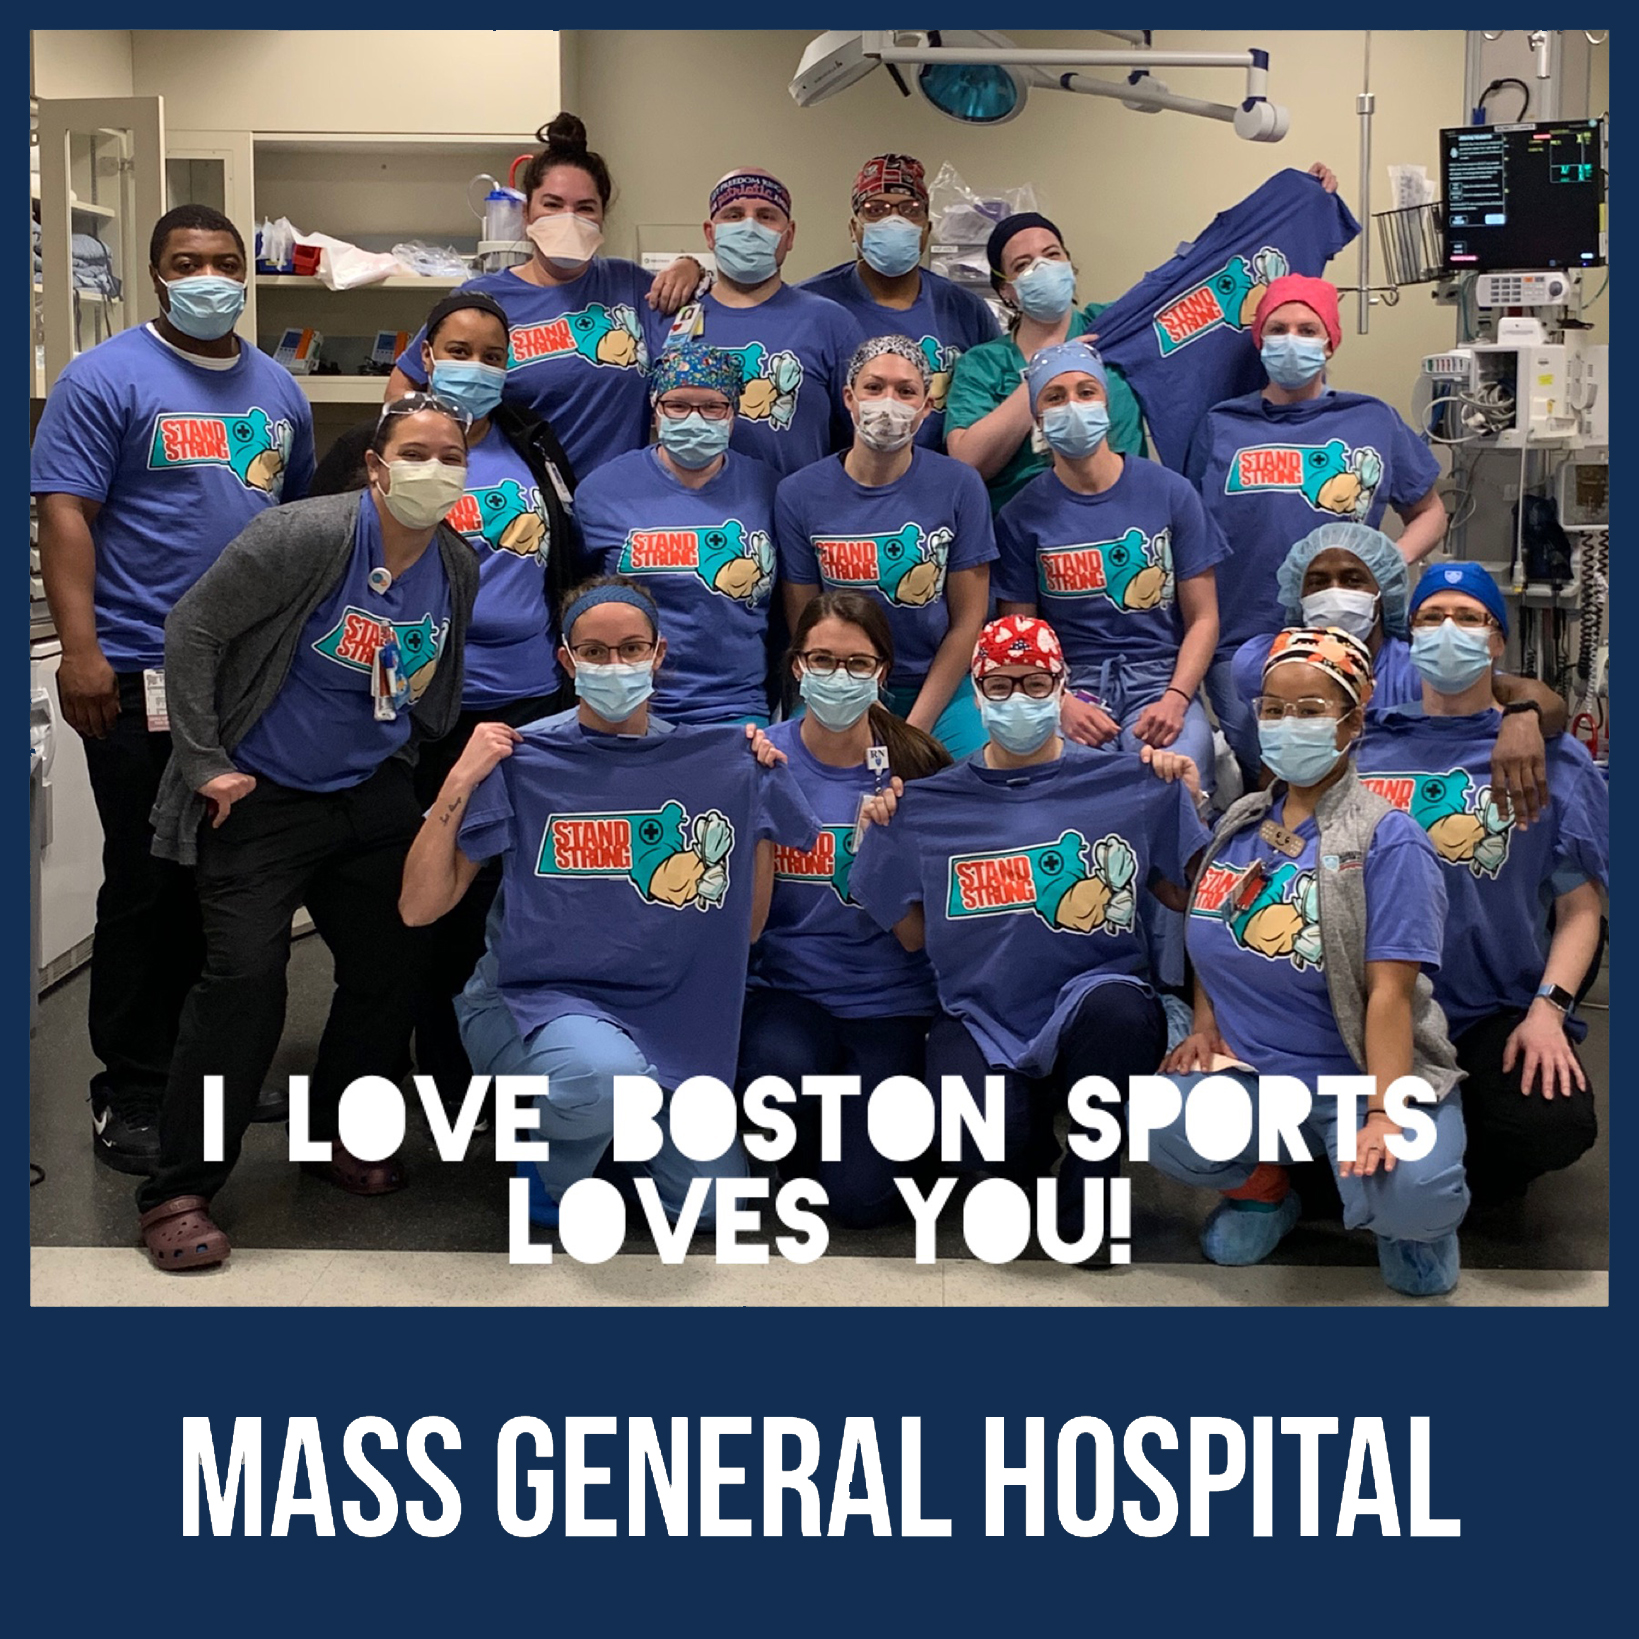 I LOVE BOSTON SPORTS IN THE COMMUNITY